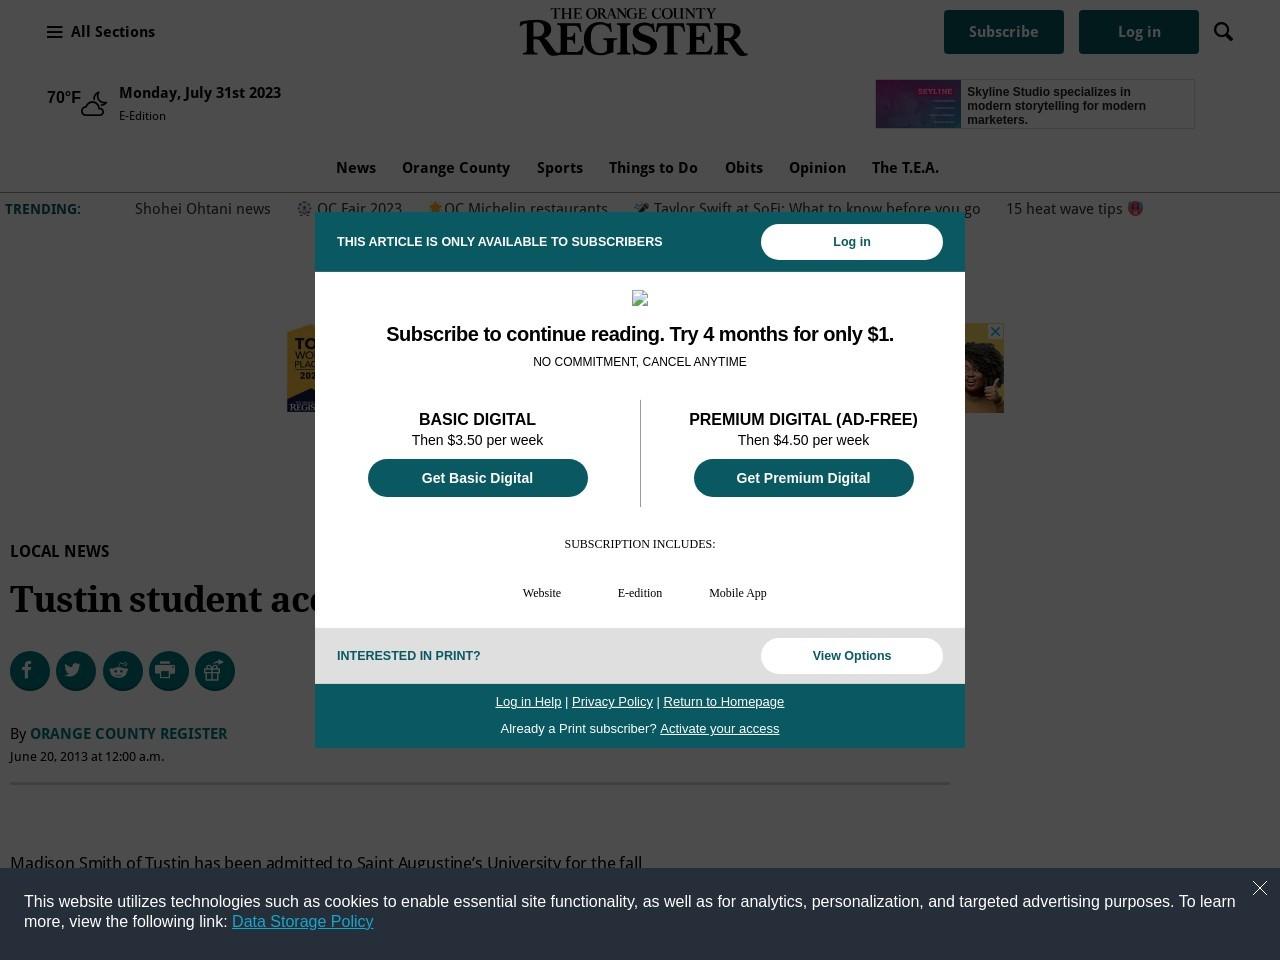 Tustin student accepted to North Carolina university